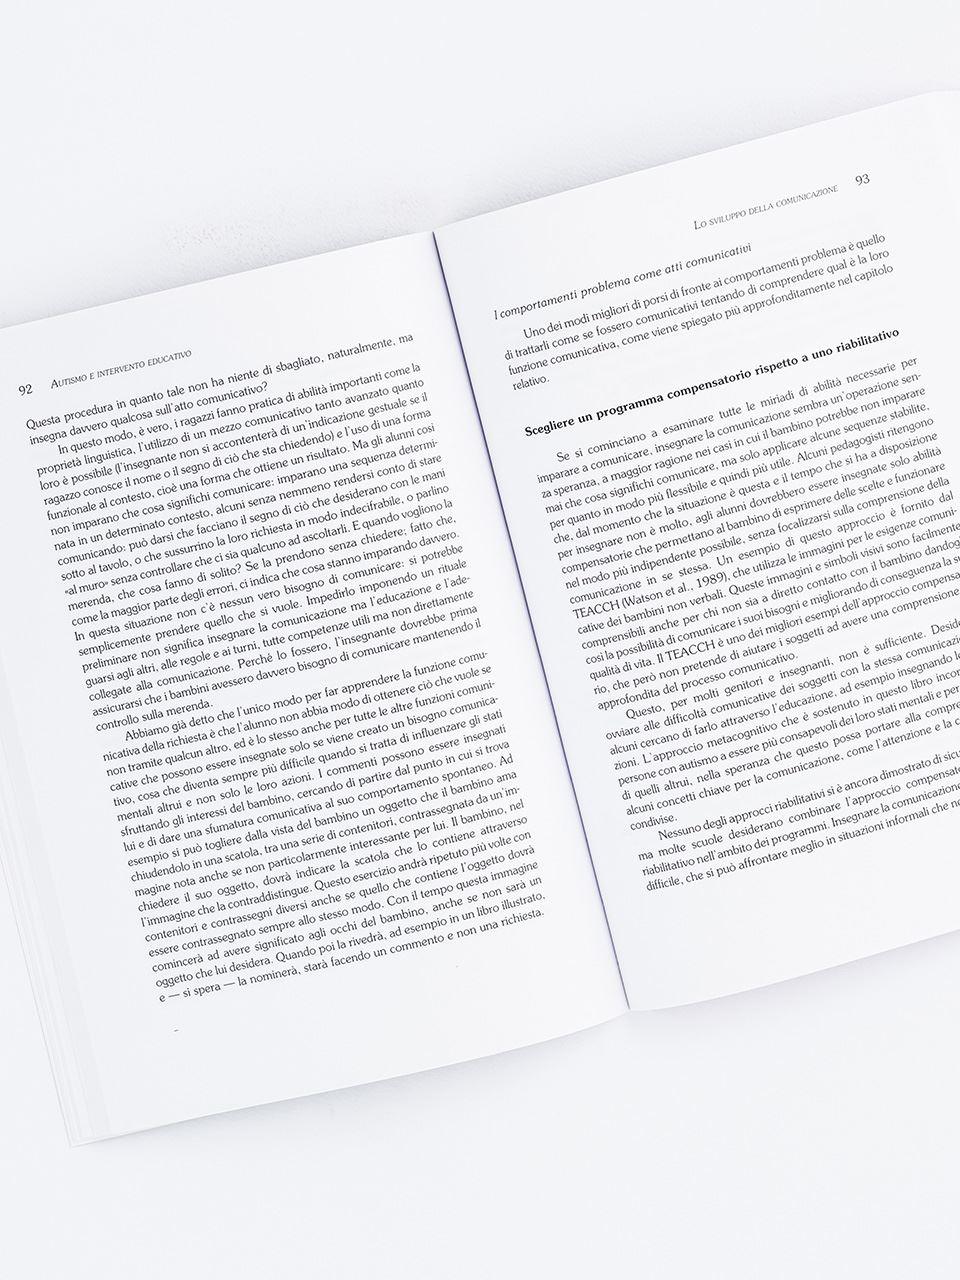 Autismo e intervento educativo - Libri - Erickson 2